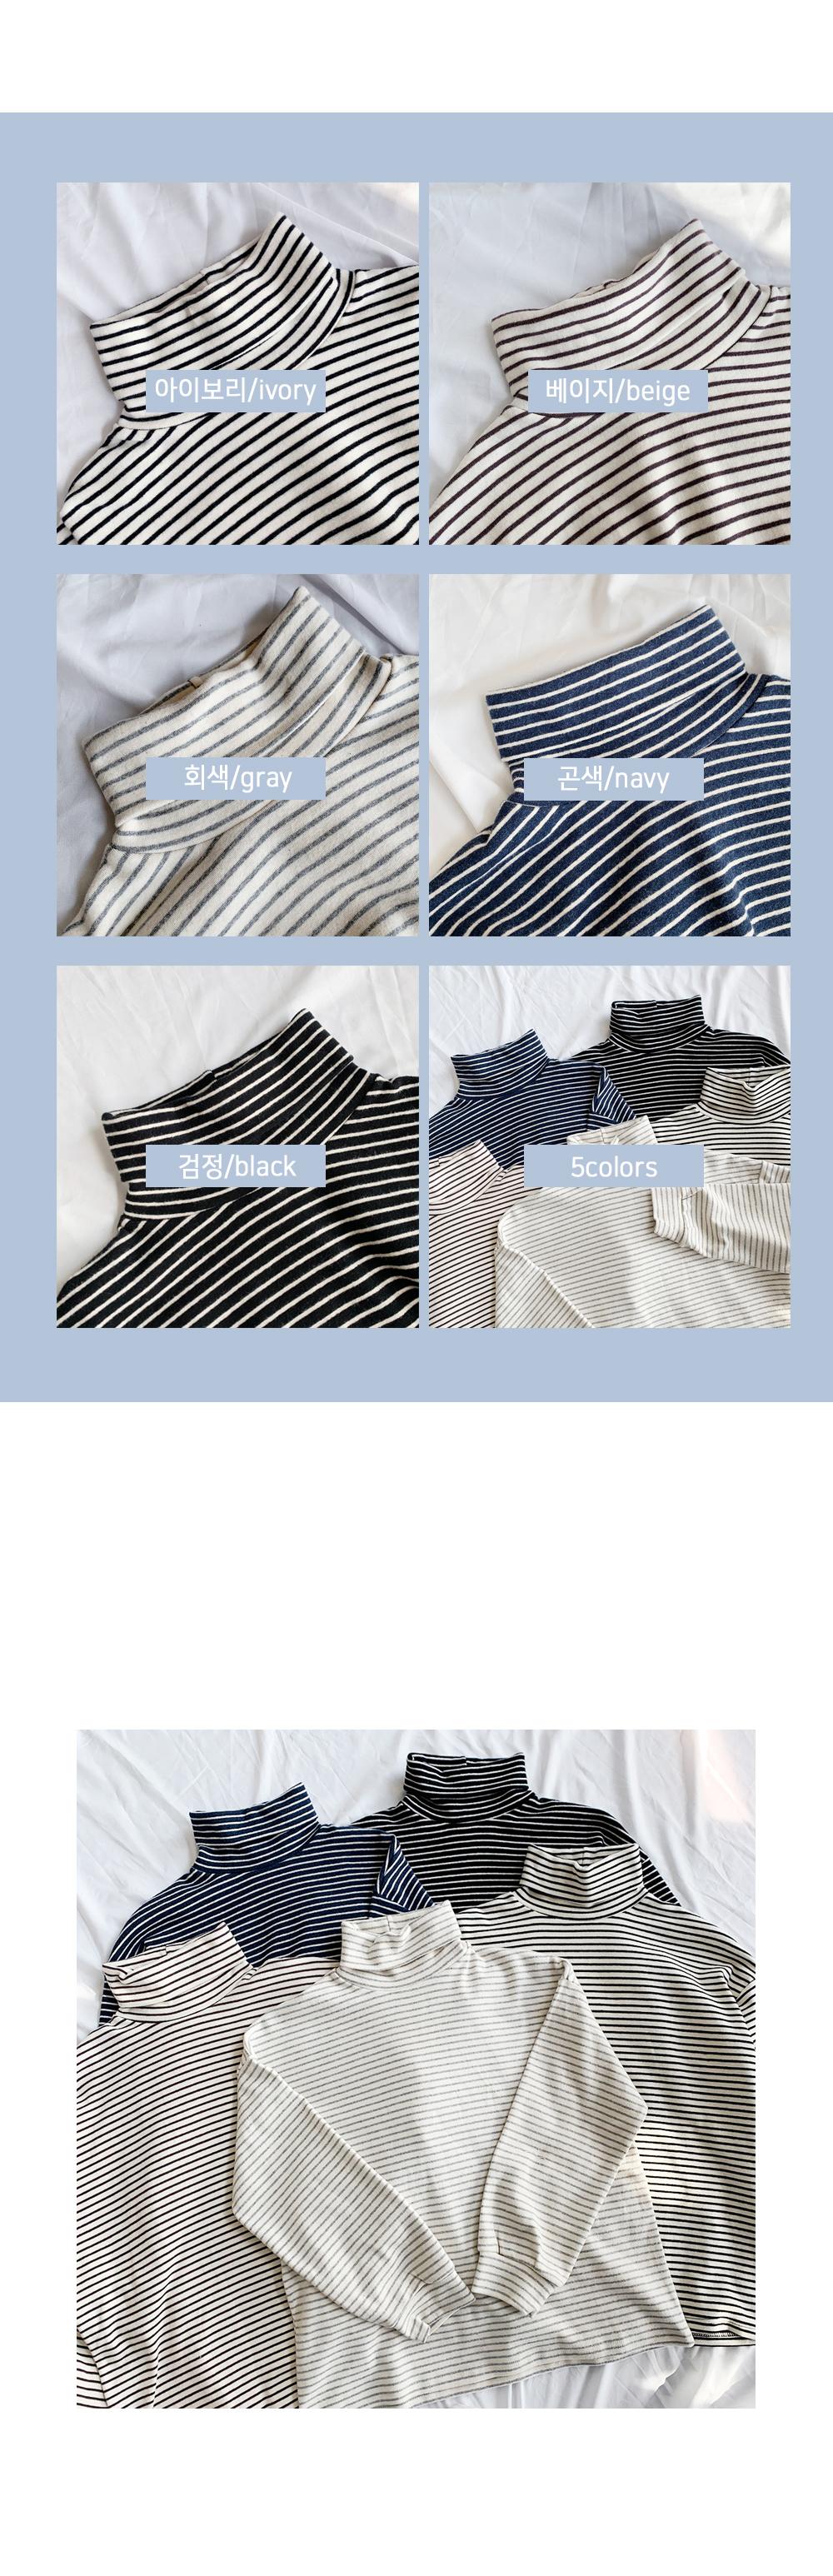 St. Turtleneck T-shirt pitch Striped